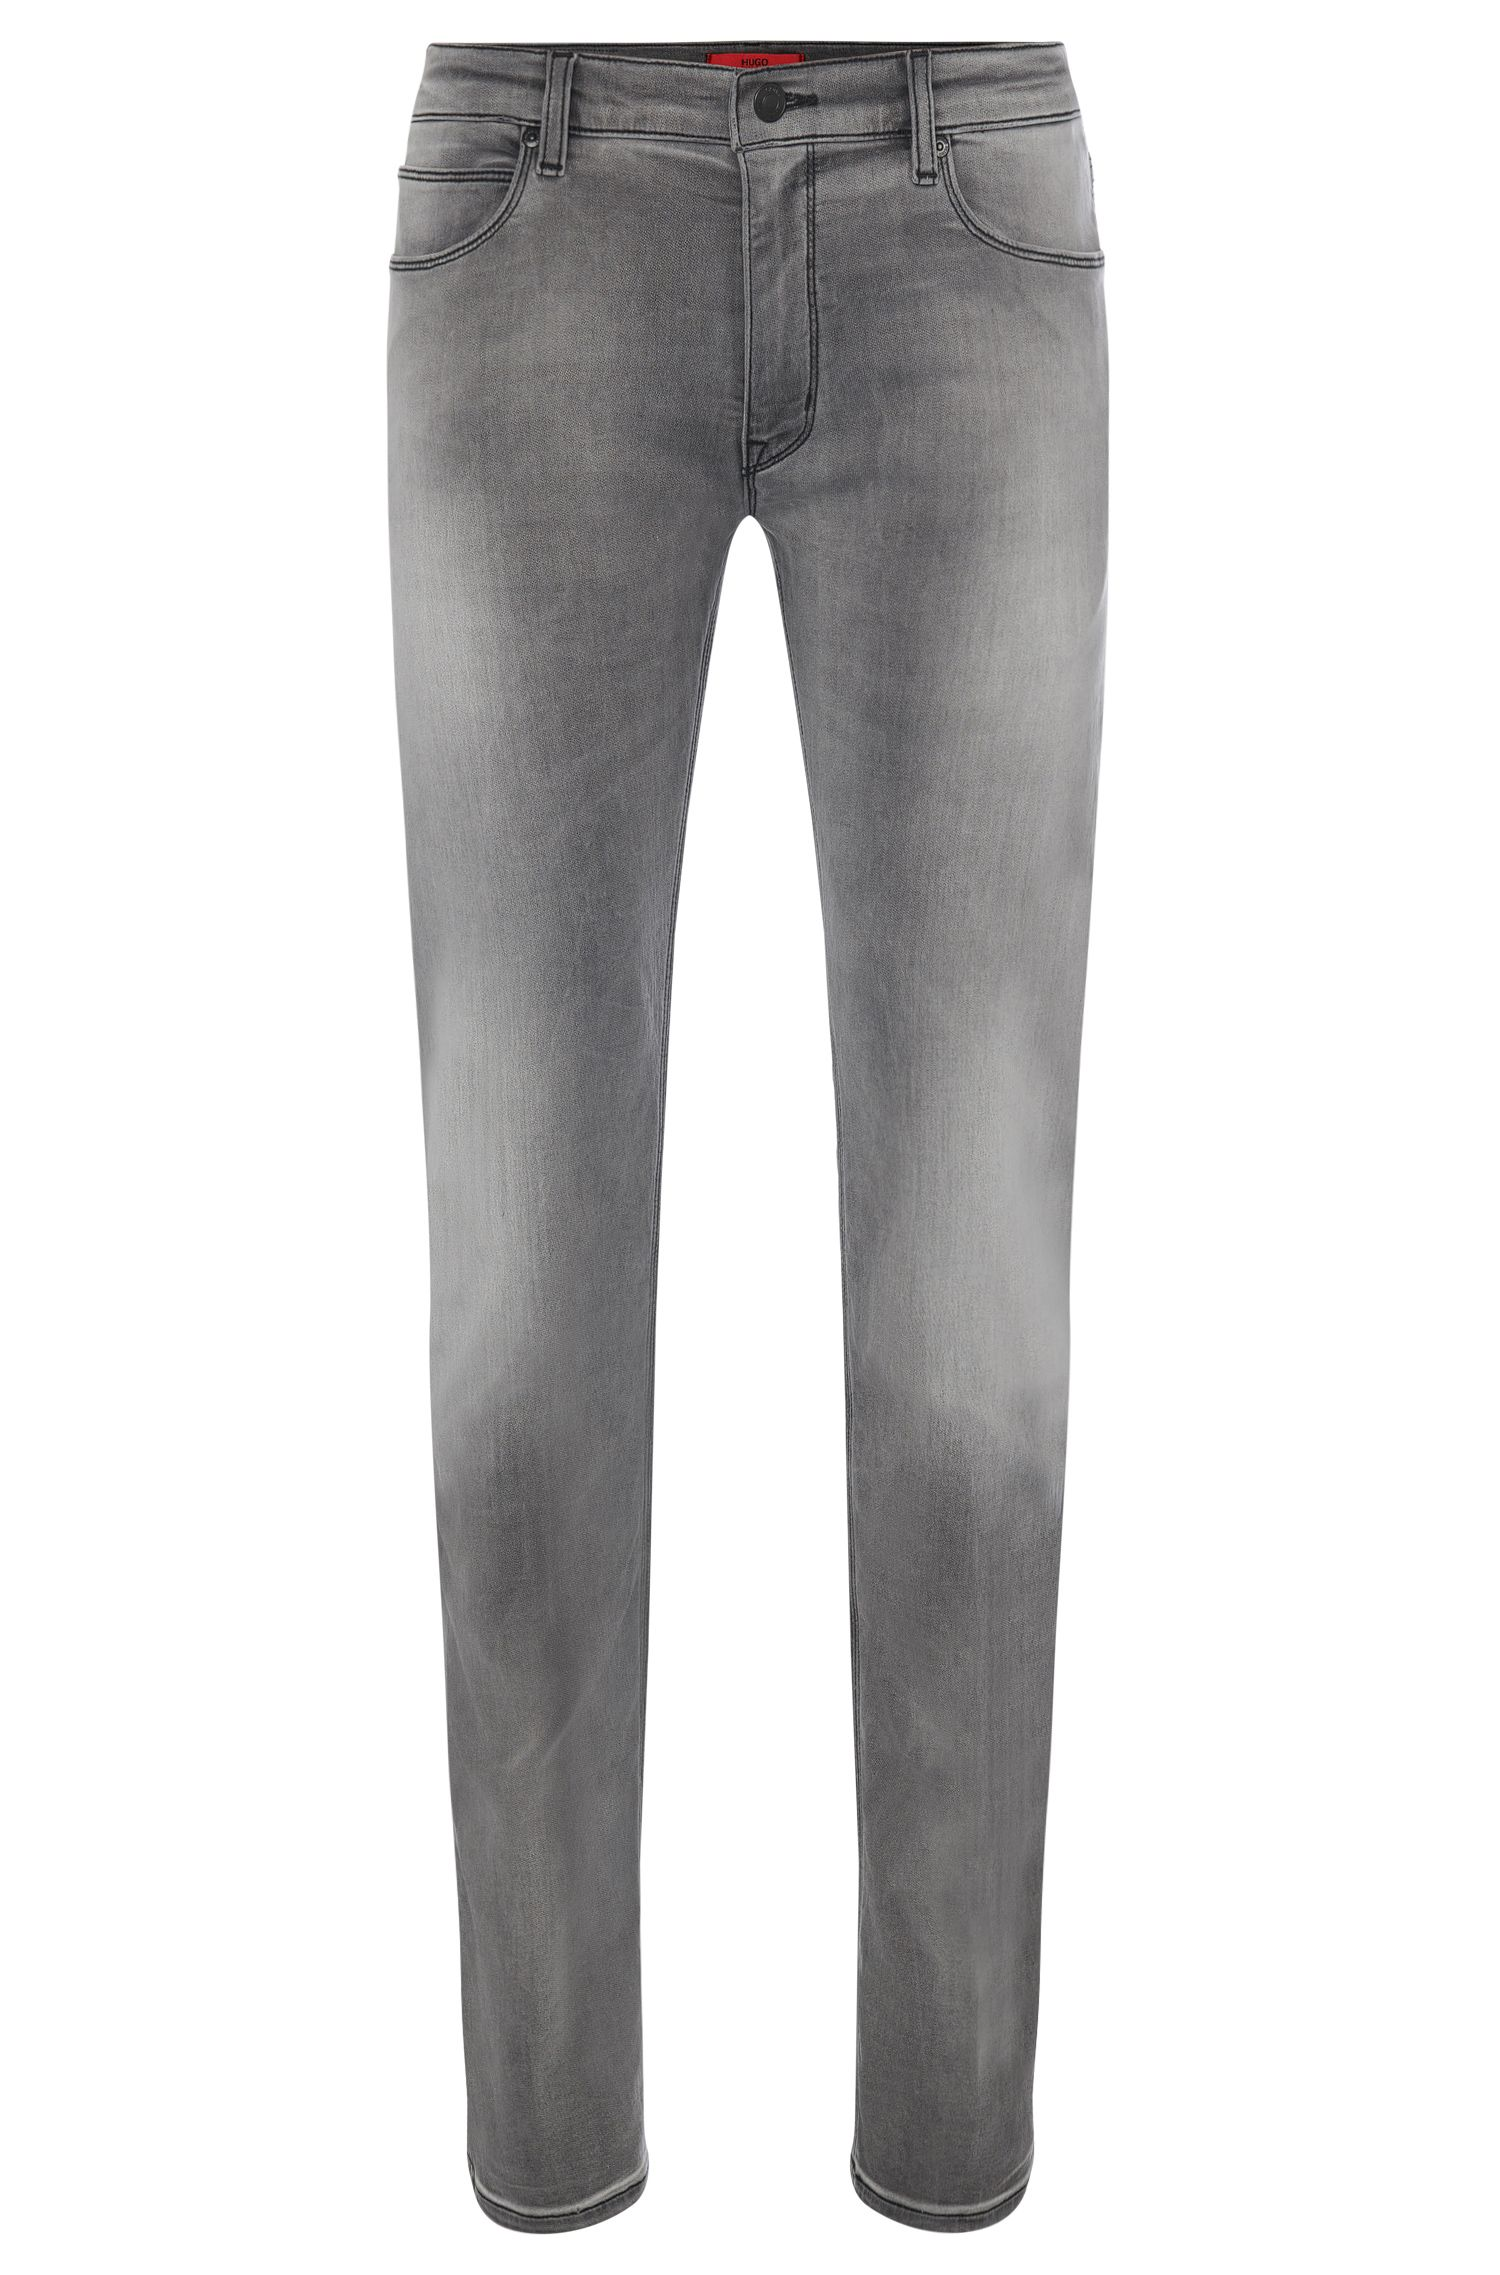 8.5 oz Stretch Cotton Blend Jeans, Slim Fit | Hugo 708